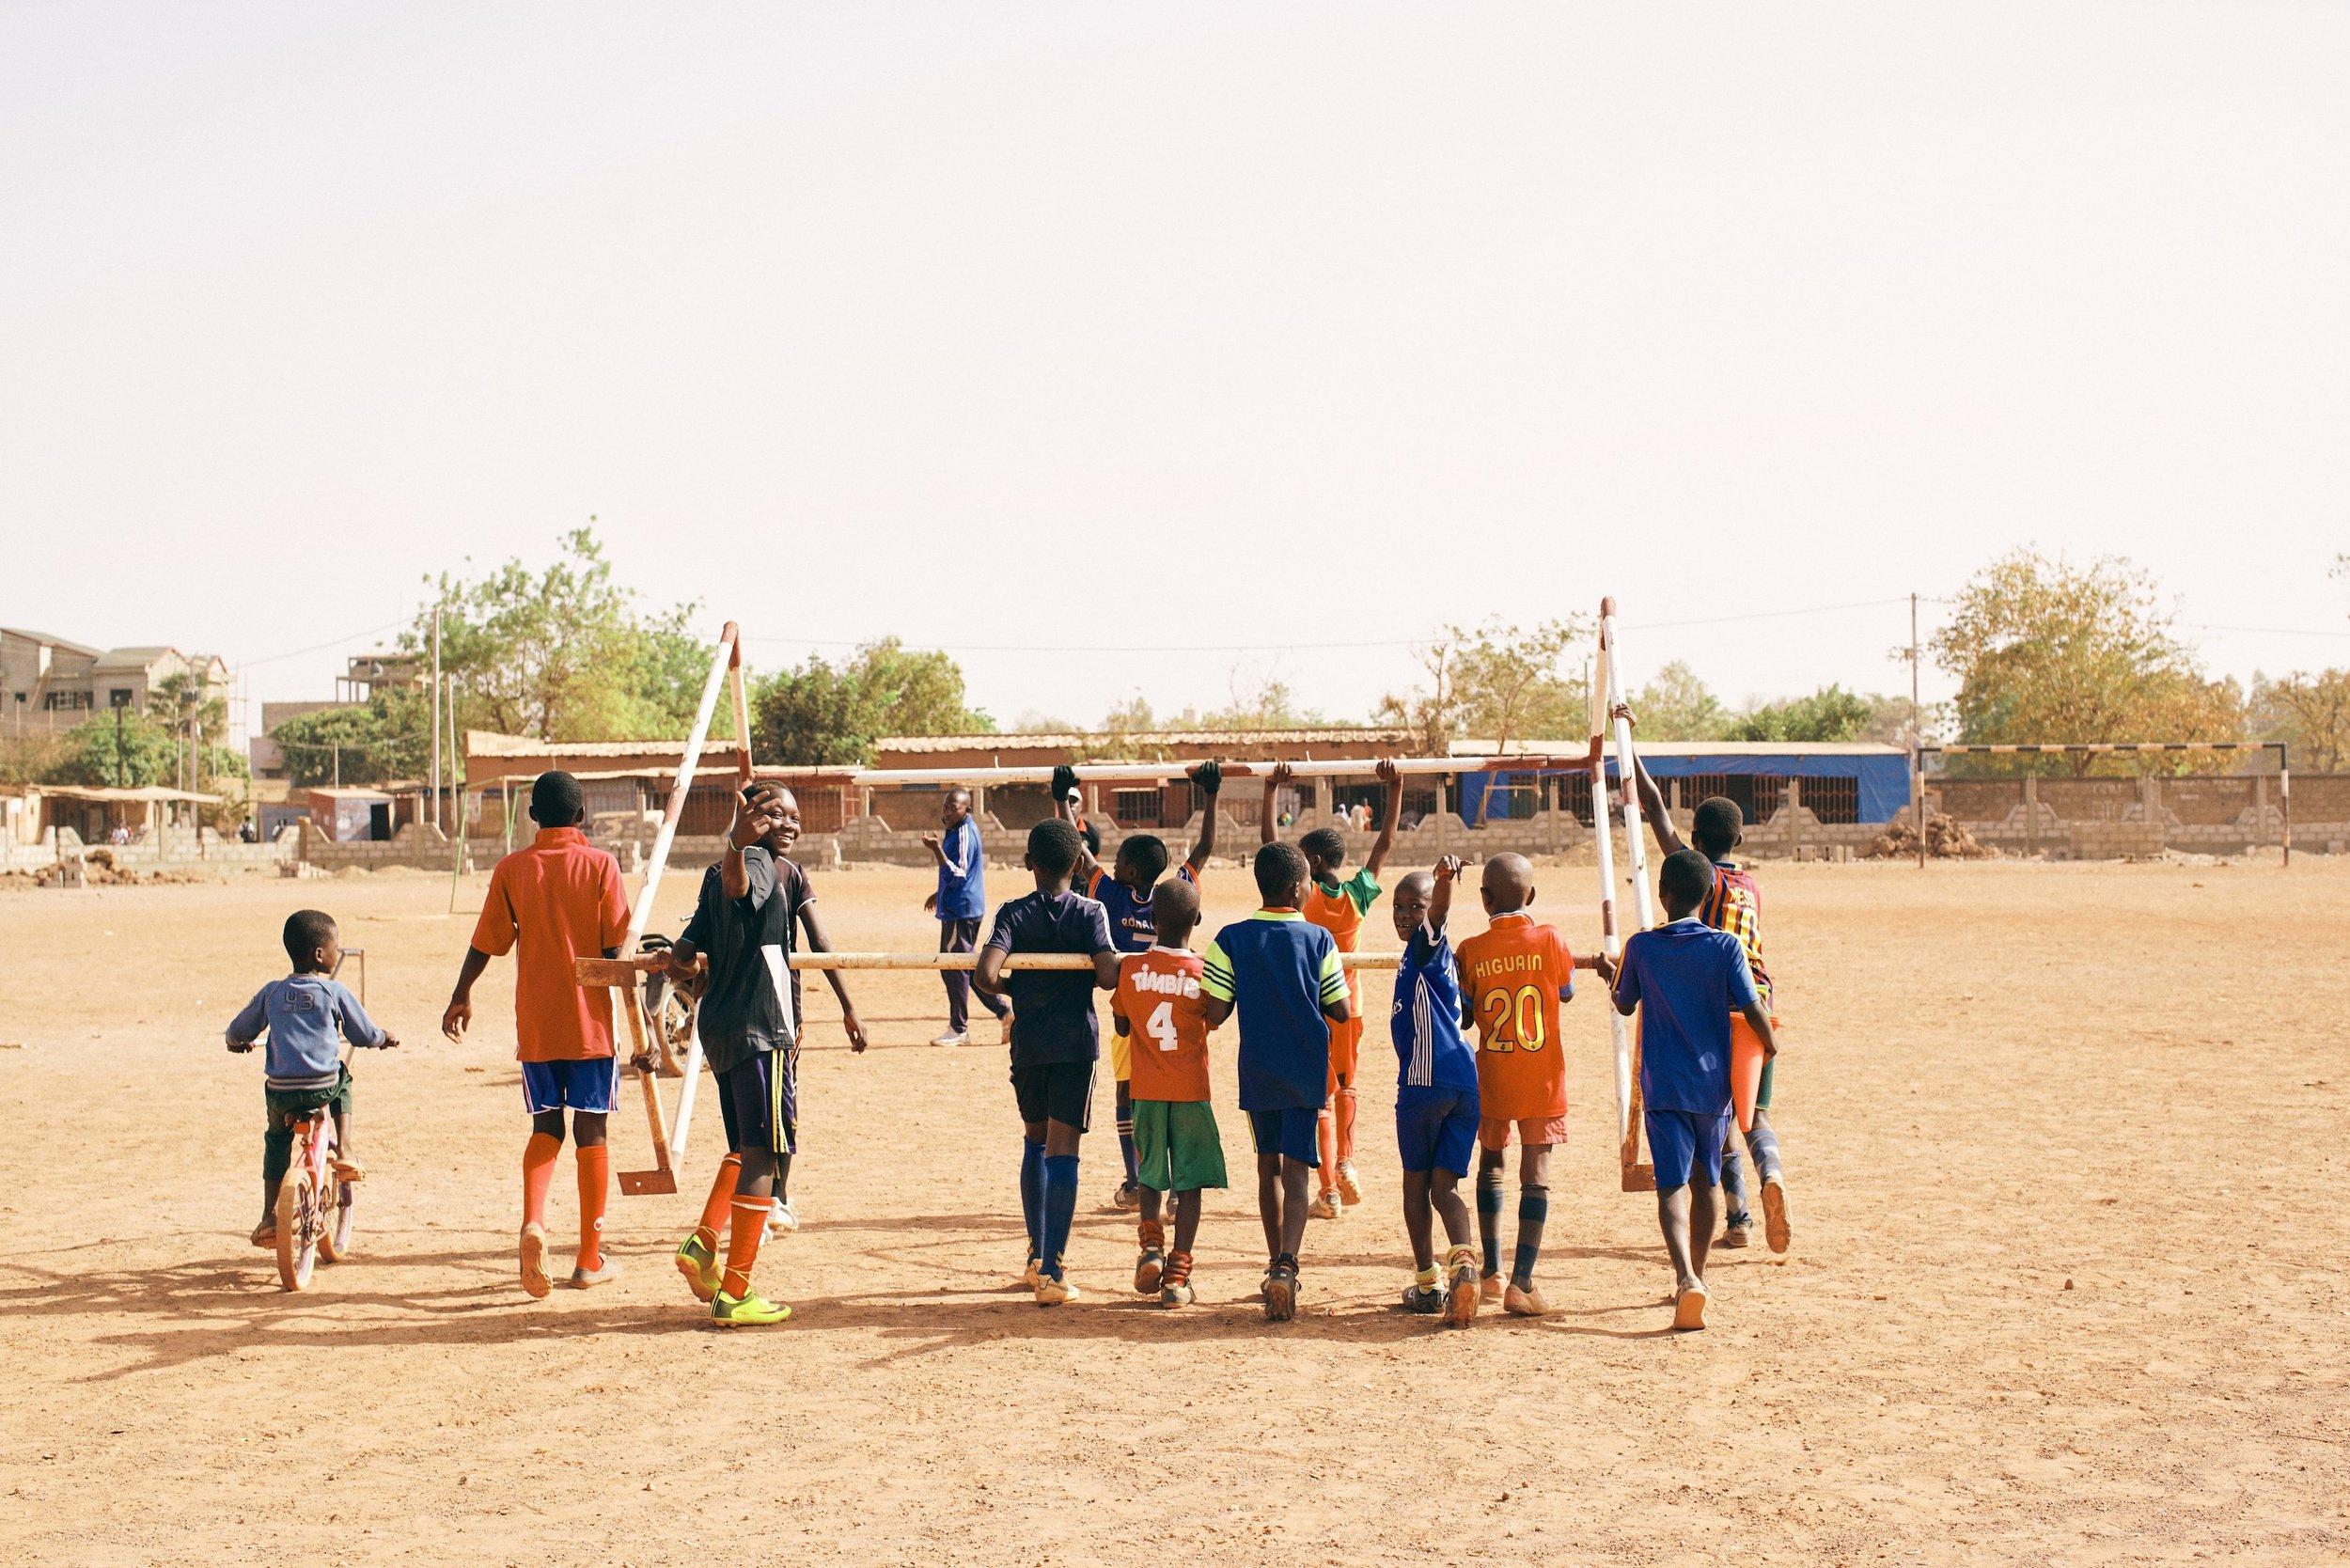 Stockdale_Ouagadougou15.jpg